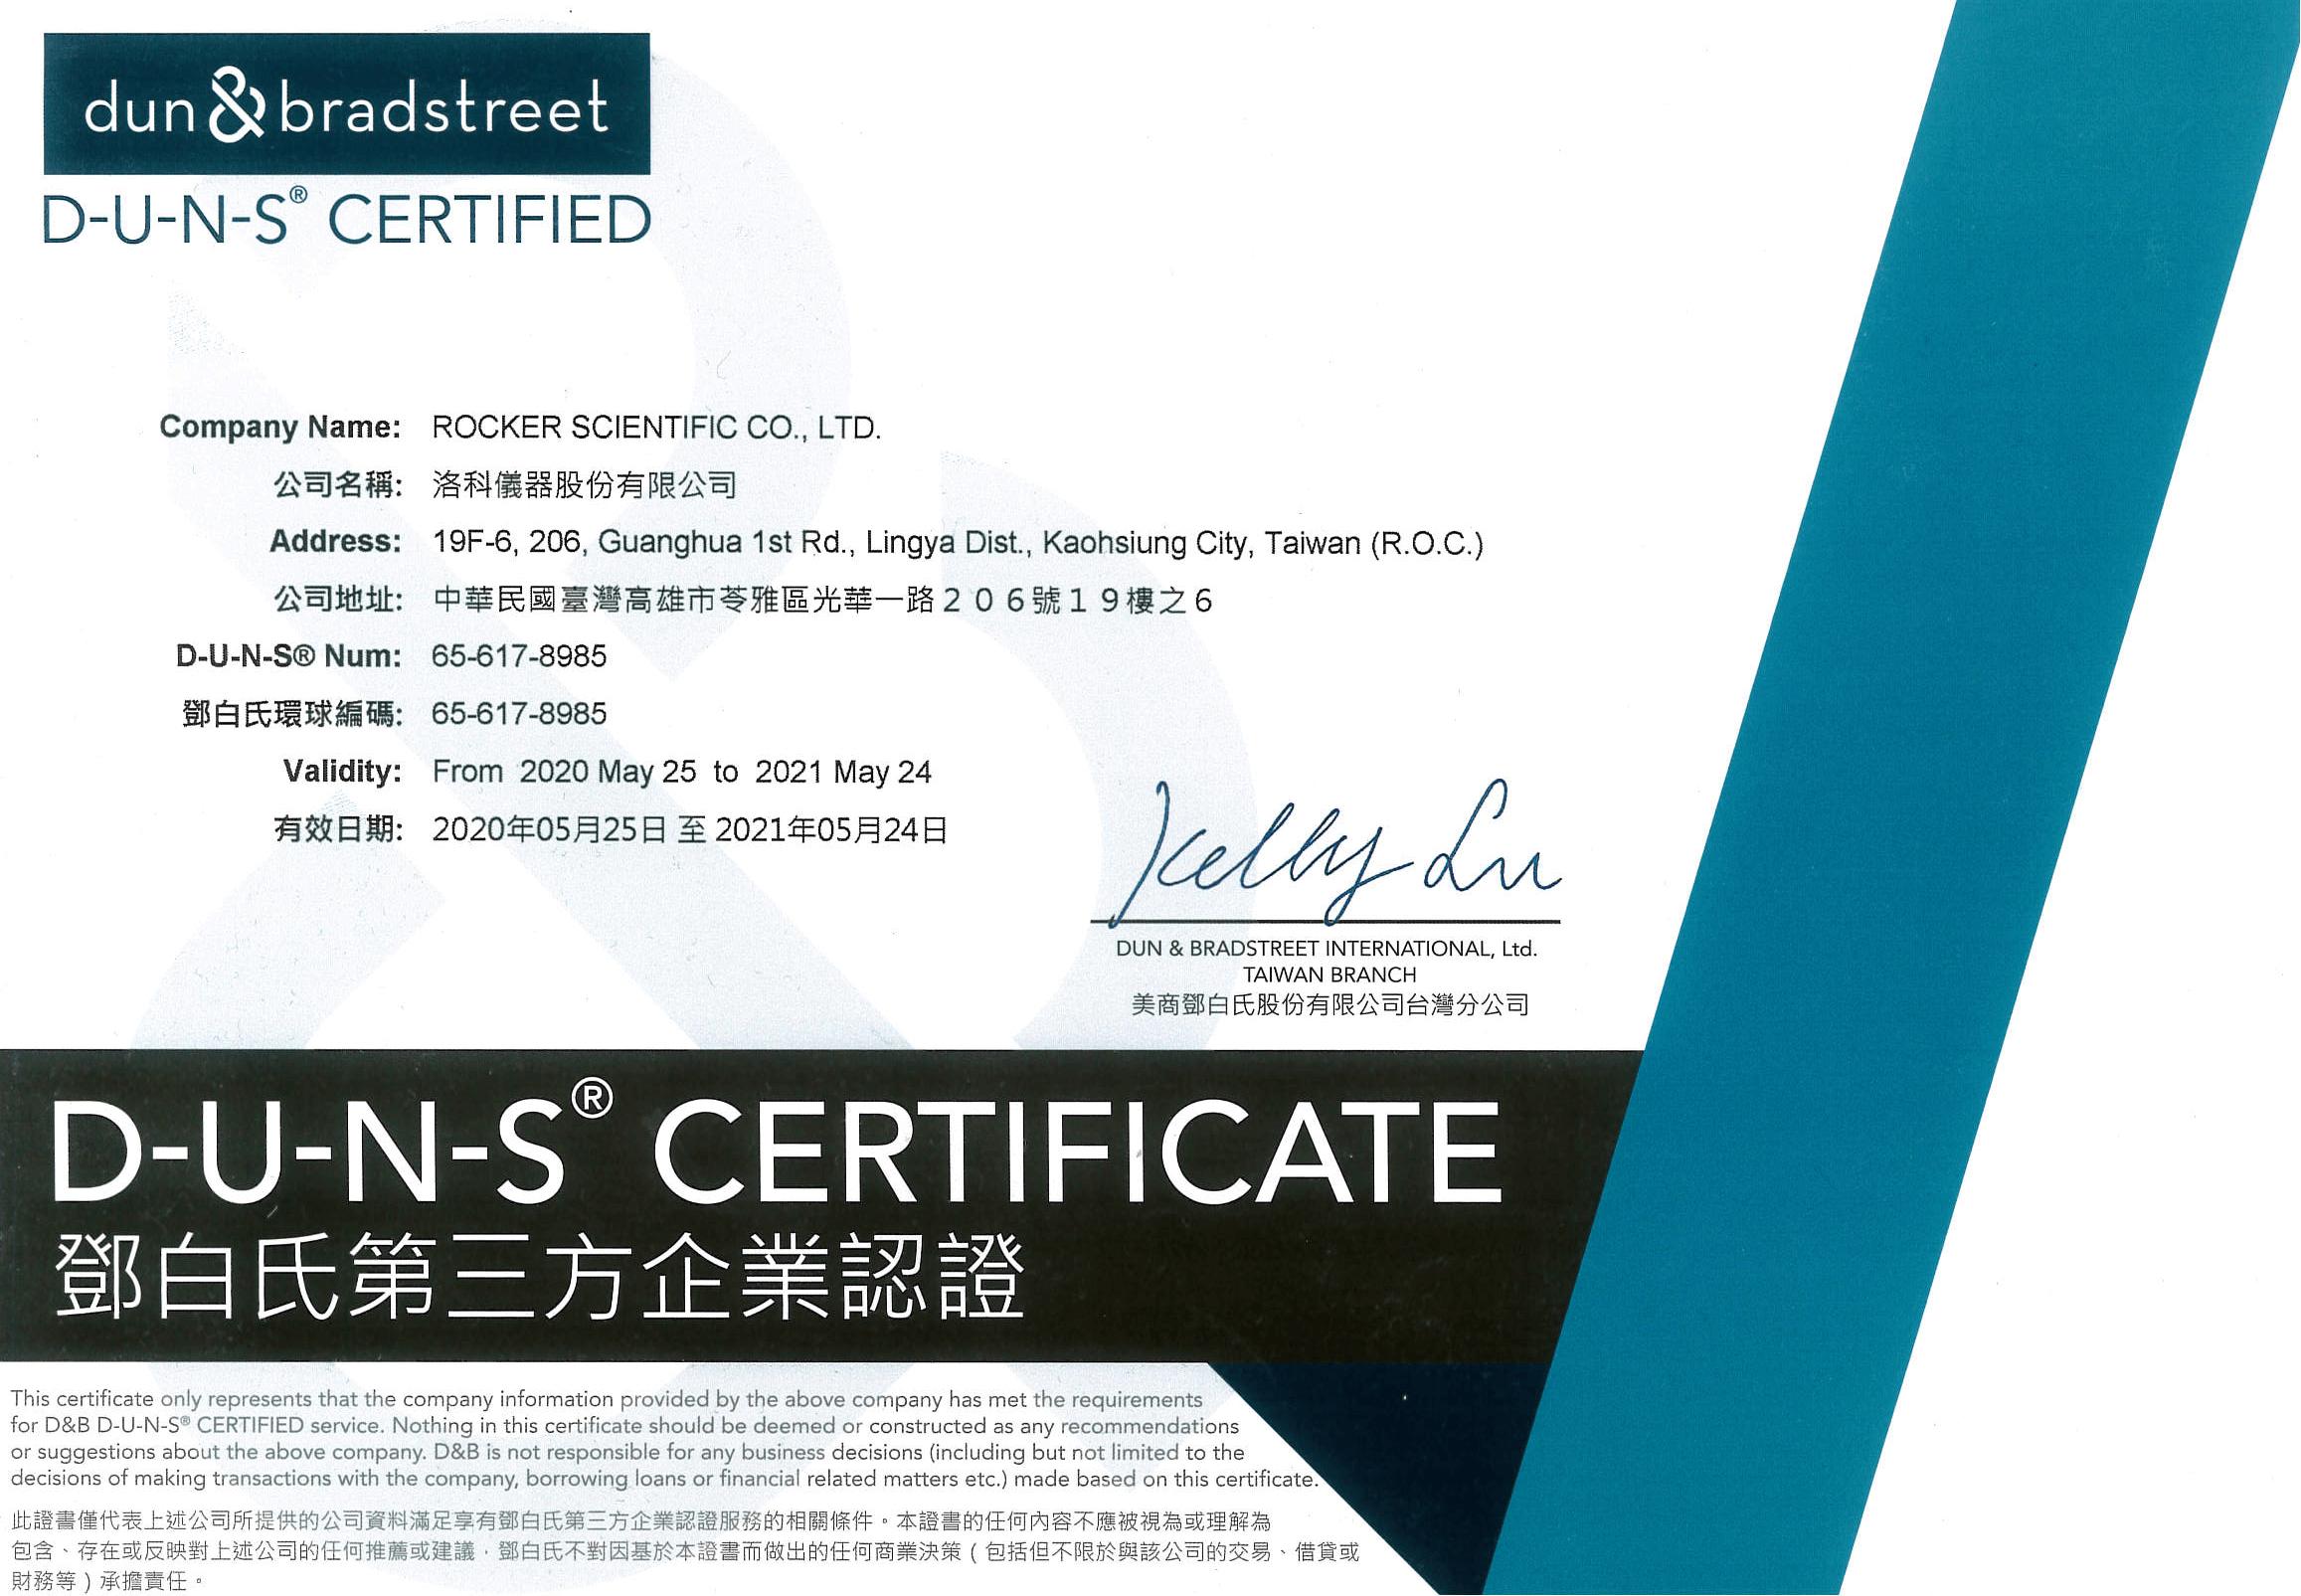 DUNS Certified